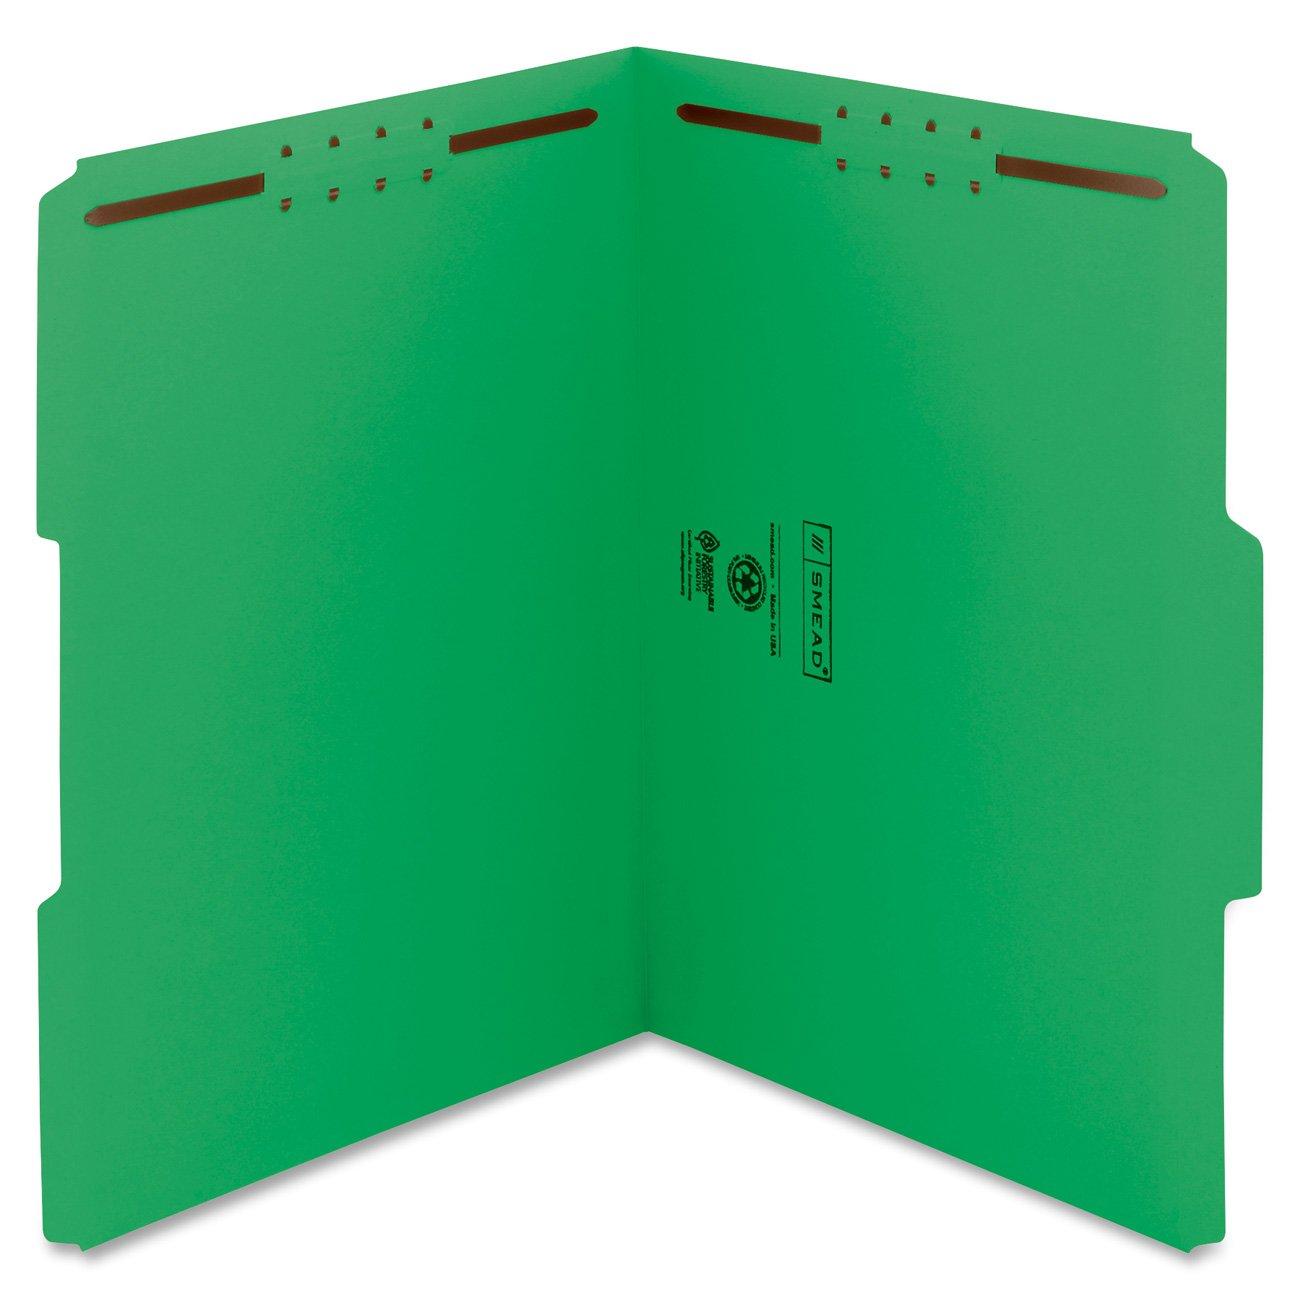 Smead Fastener File Folder, 2 Fasteners, Reinforced 1/3-Cut Tab, Letter Size, Green, 50 per Box (12140) by Smead